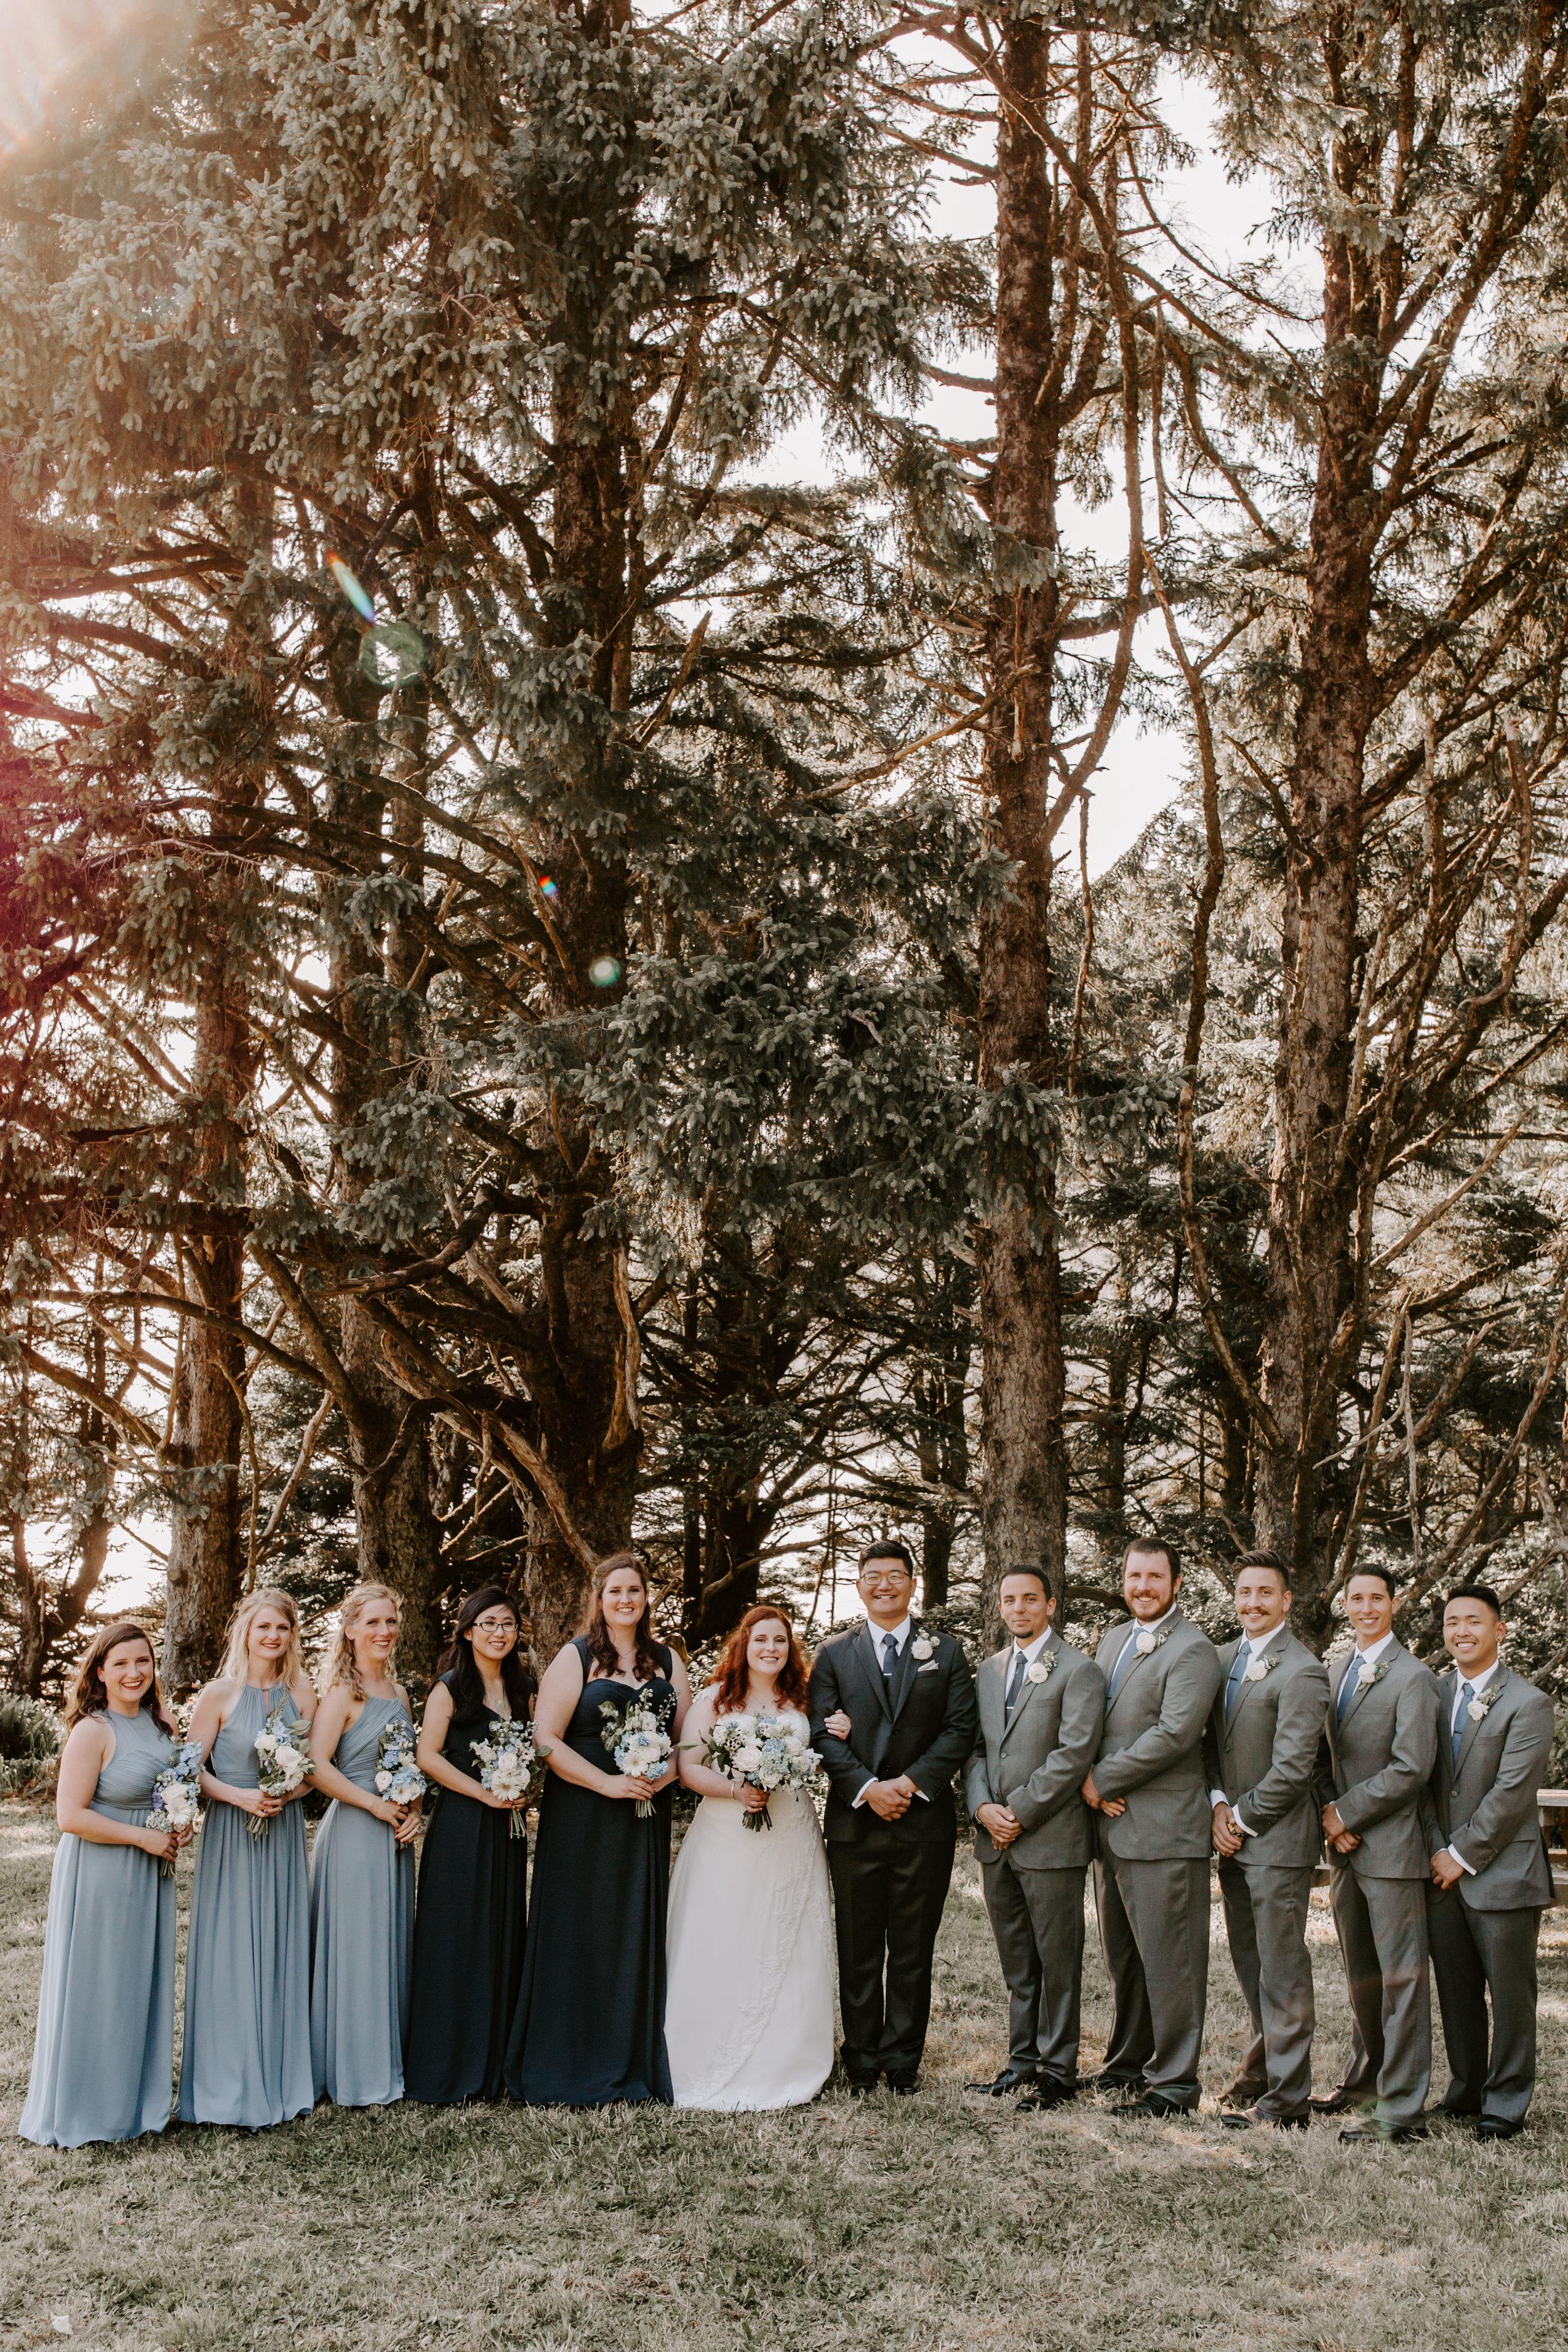 Oregon Wedding Photographer | Woodland Wedding Inspiration | Rustic Bloom Photography